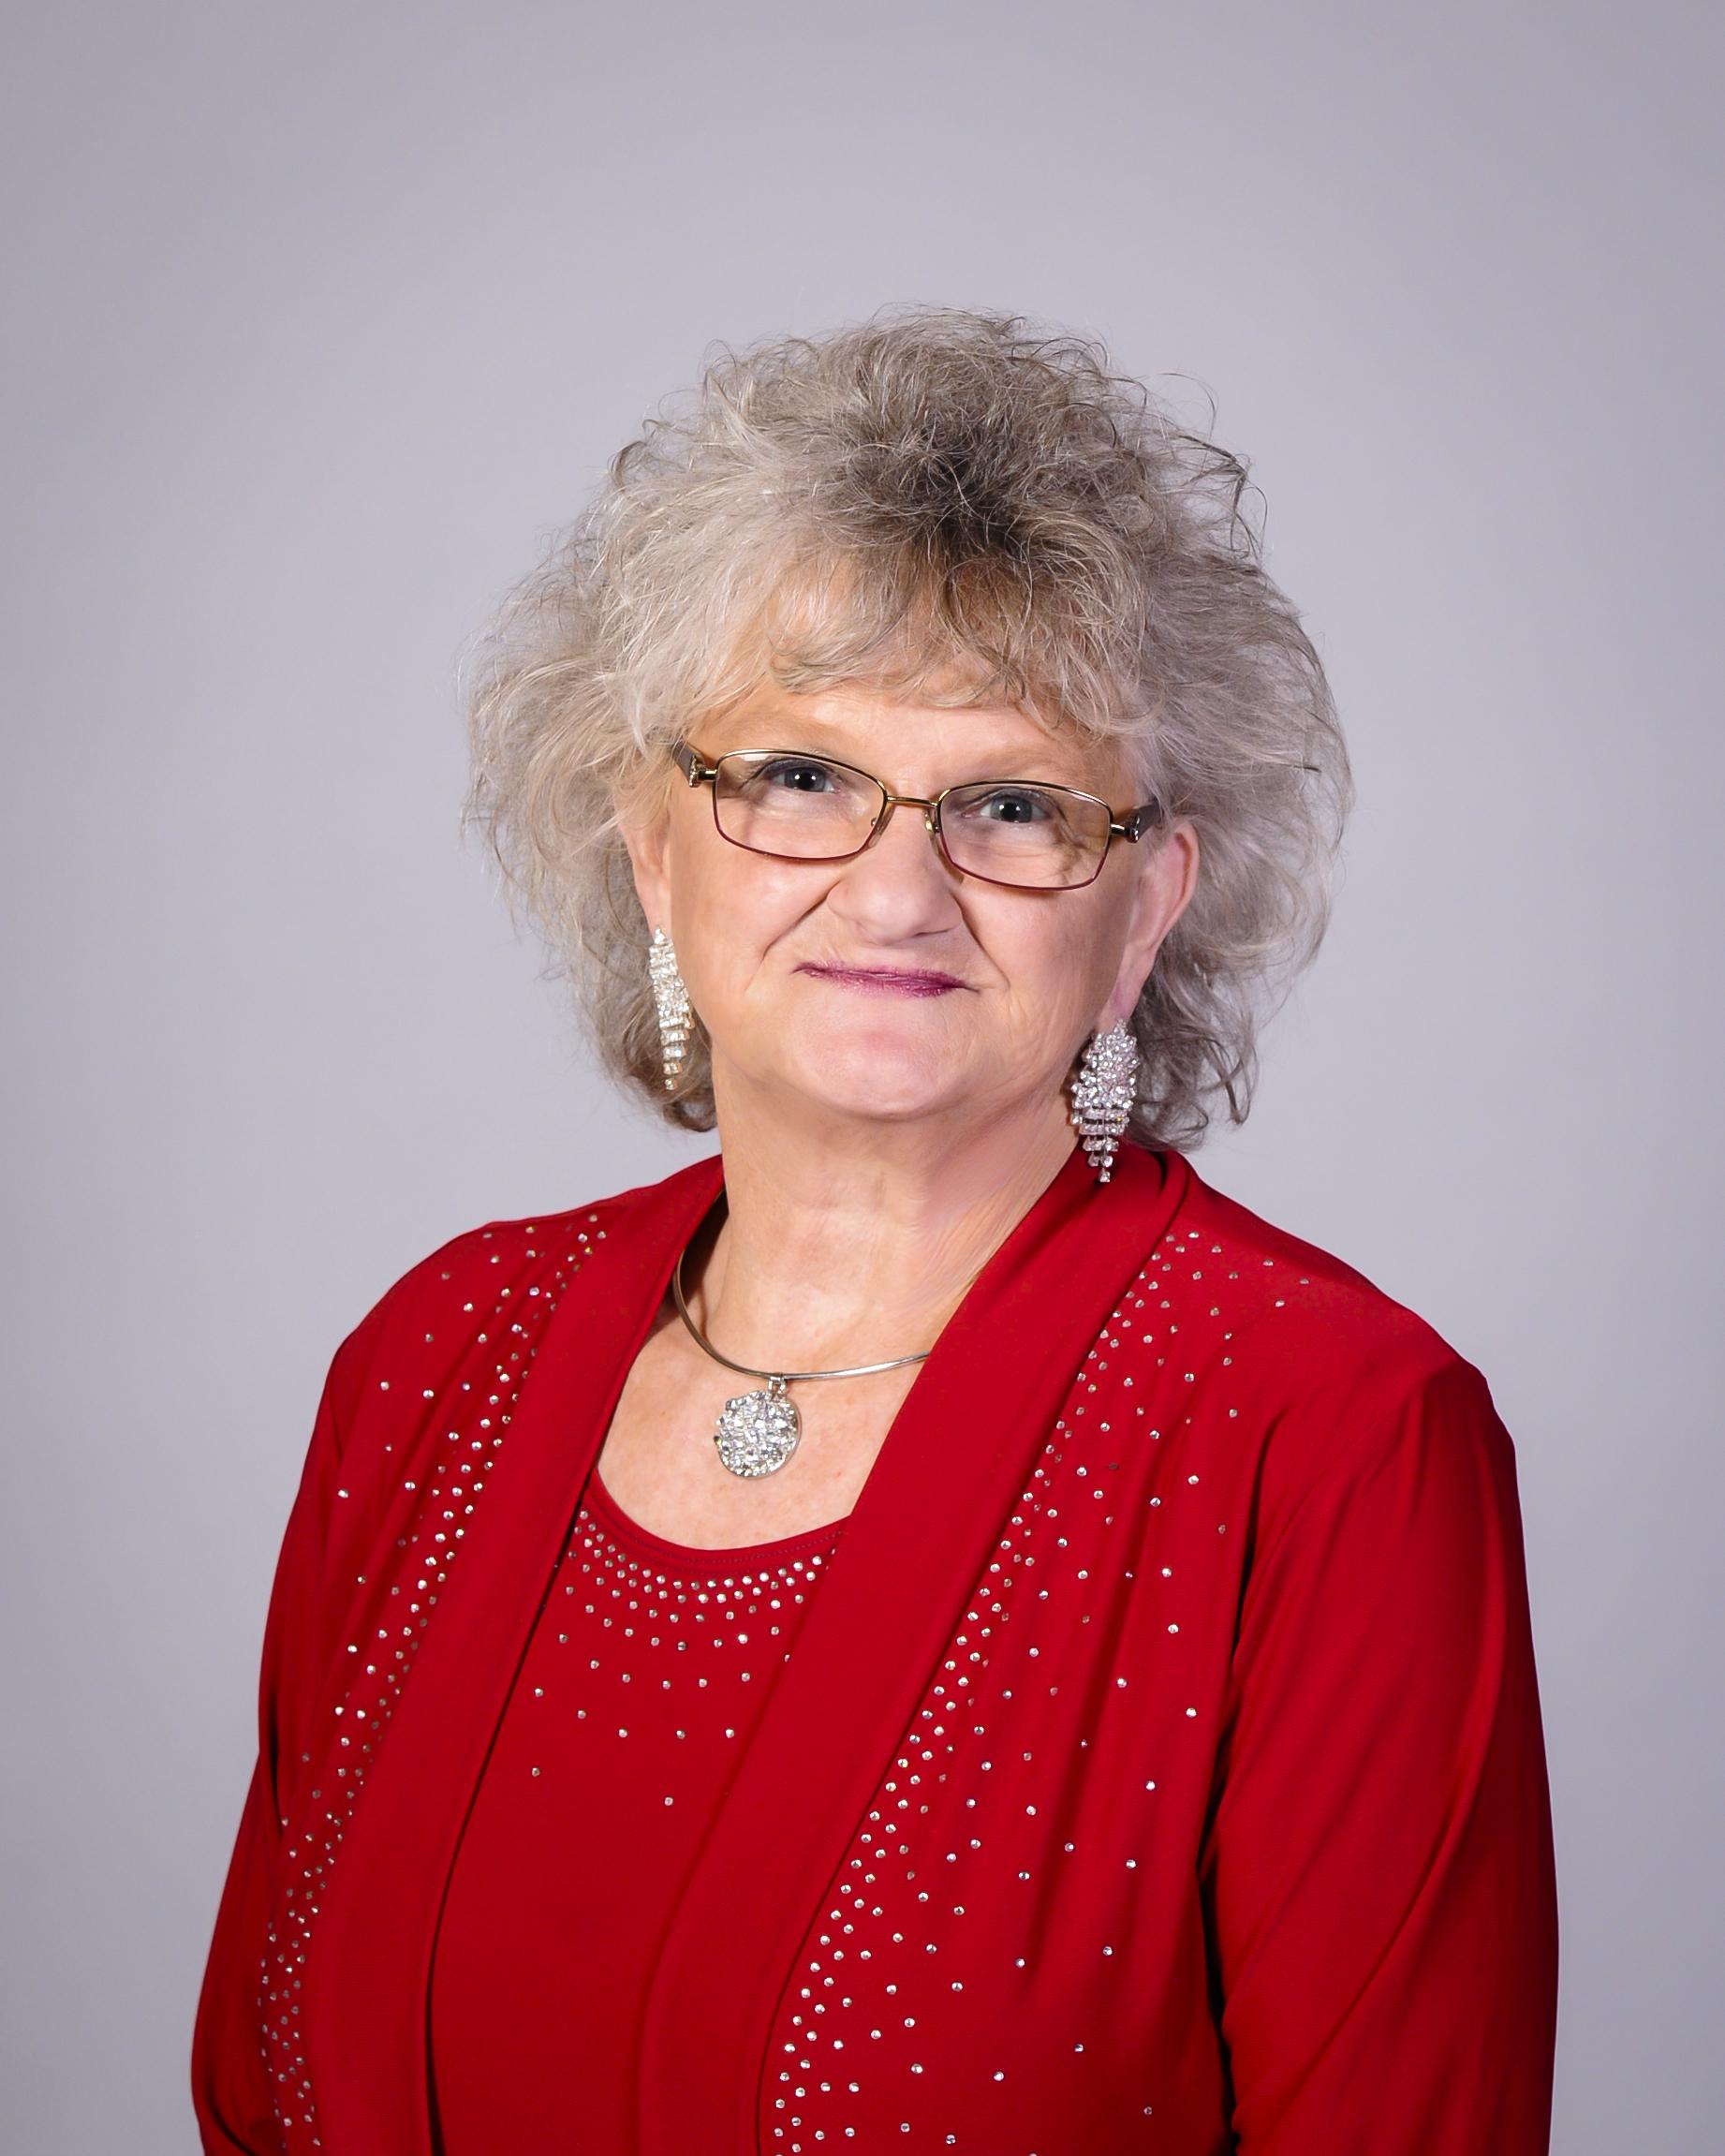 Sharon Hartline